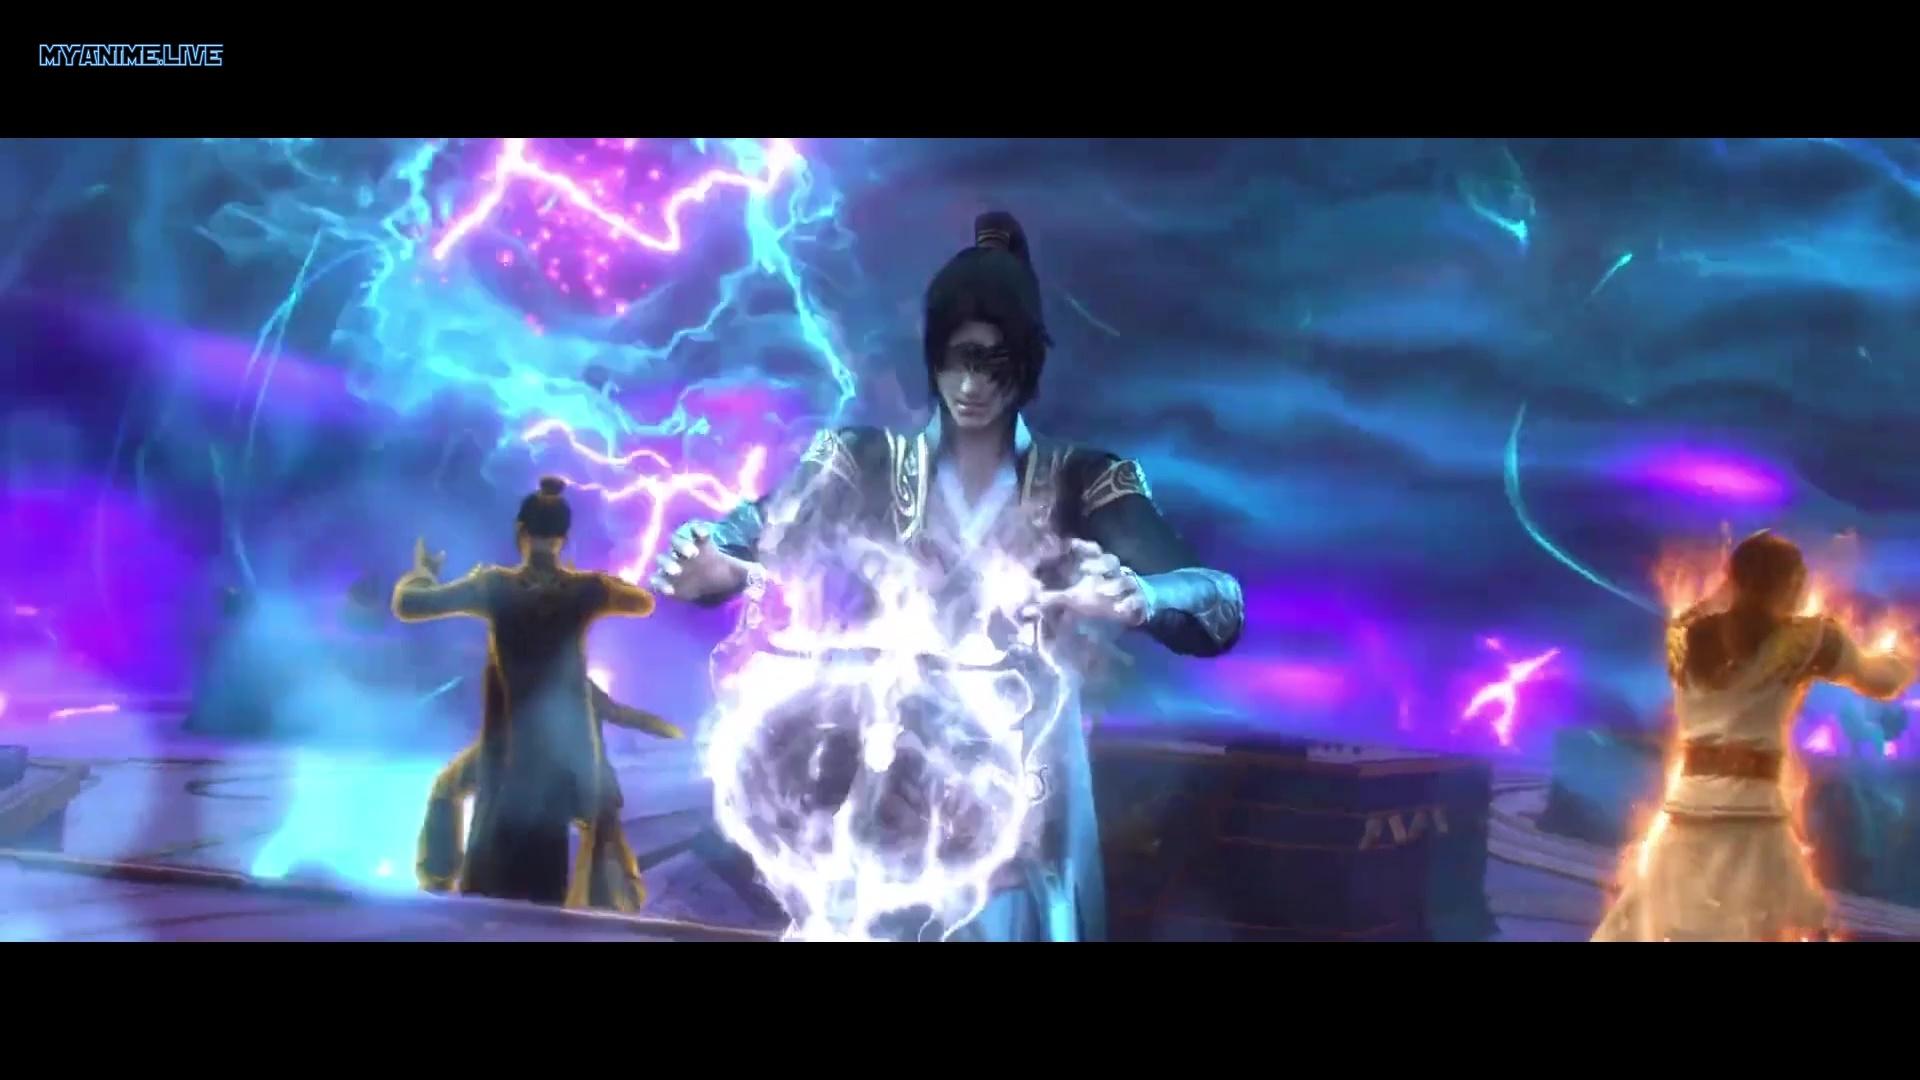 Fights Break Sphere 4th Season - Battle Through the Heavens 4th Season episode 20 english sub